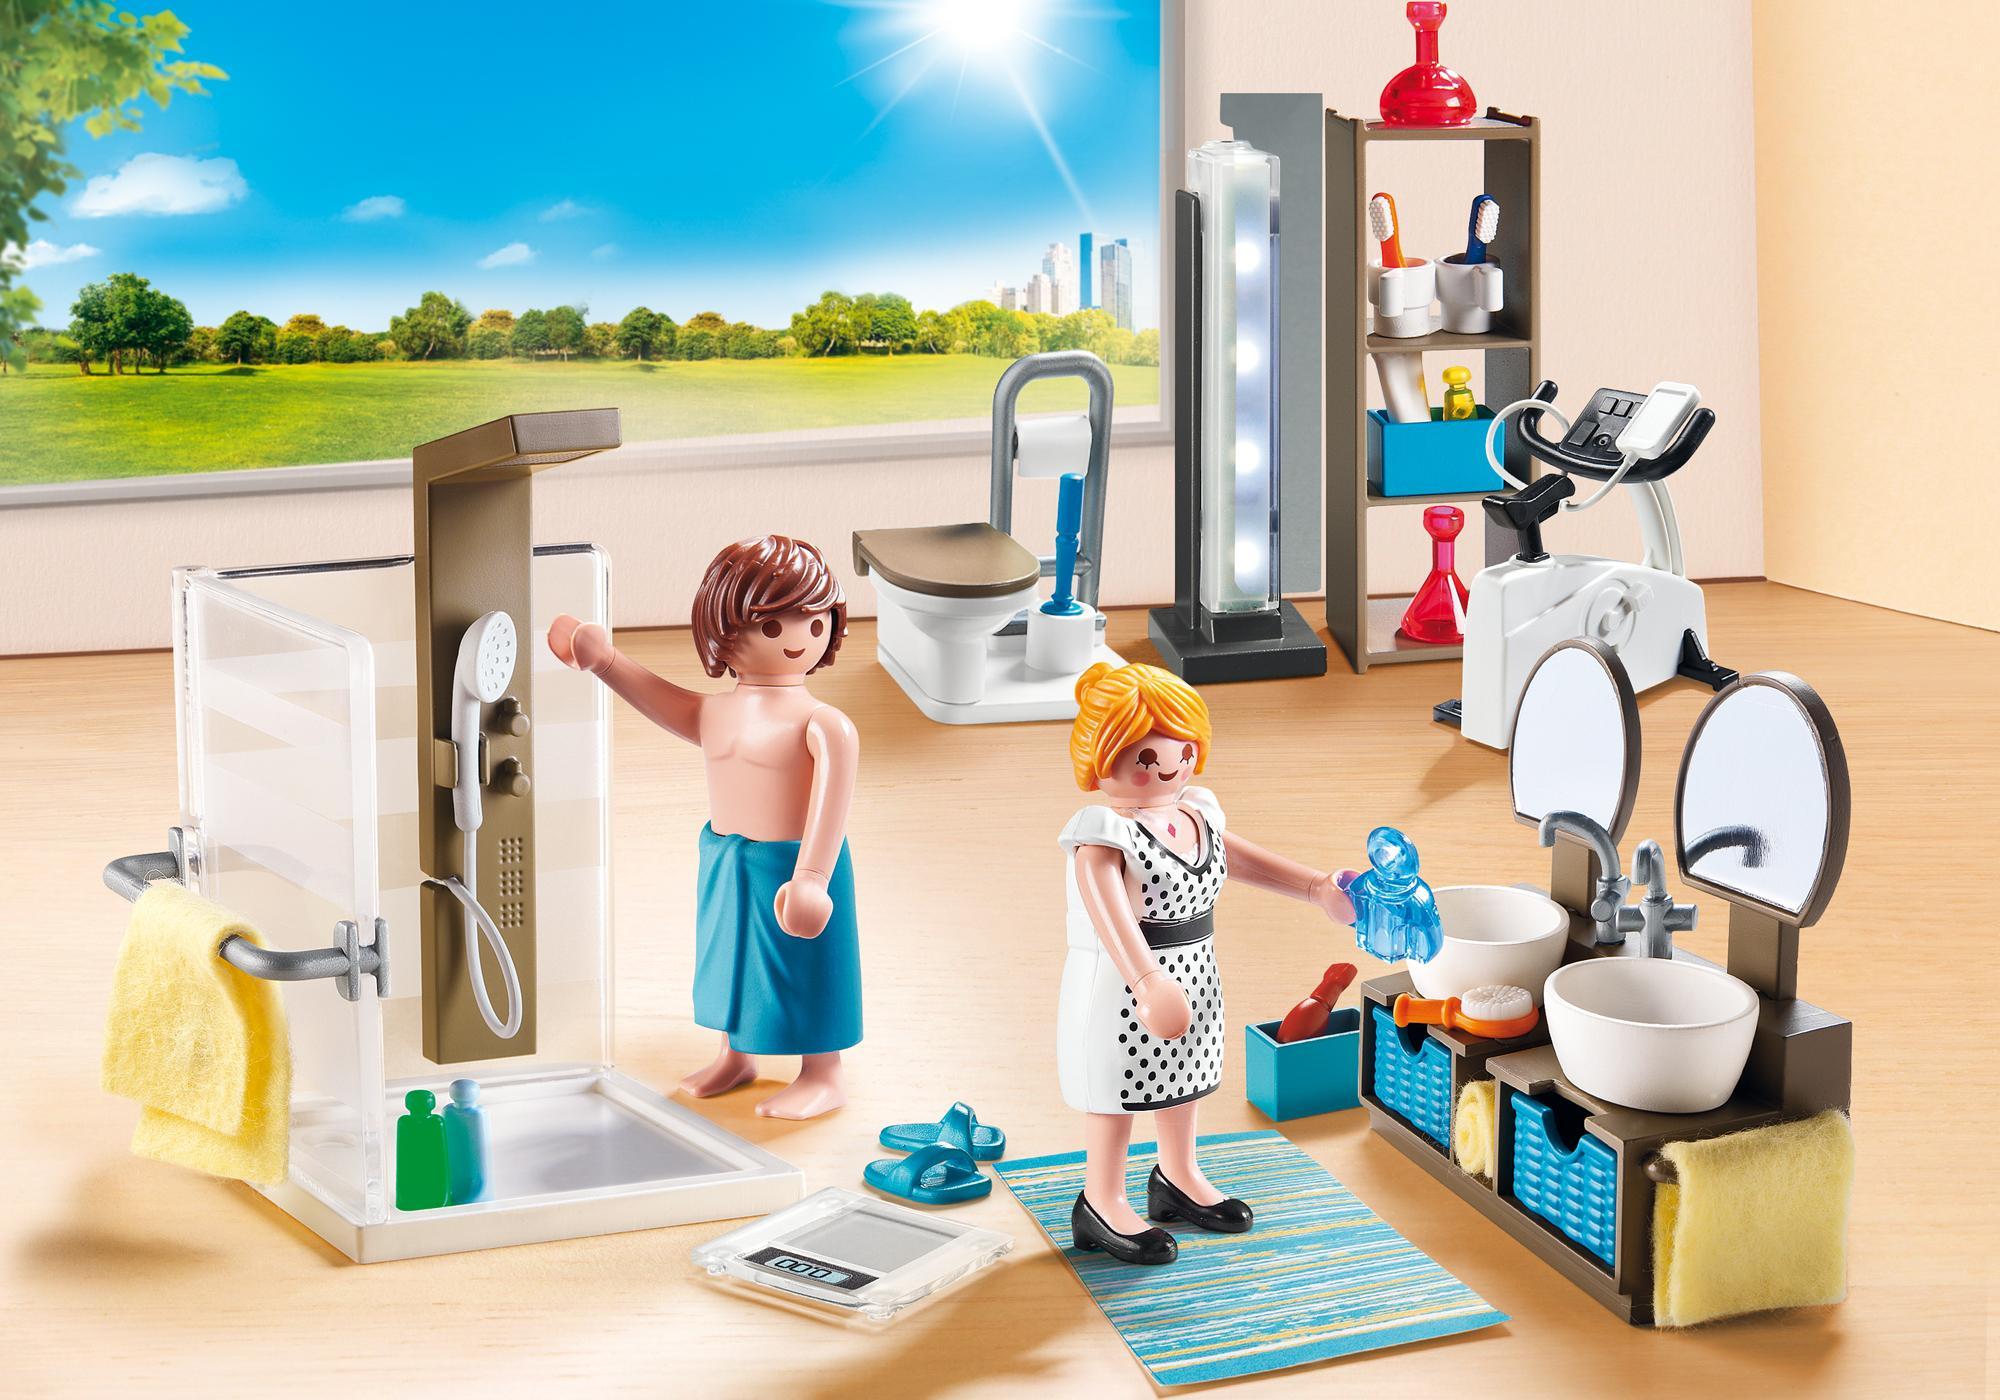 http://media.playmobil.com/i/playmobil/9268_product_detail/Badezimmer